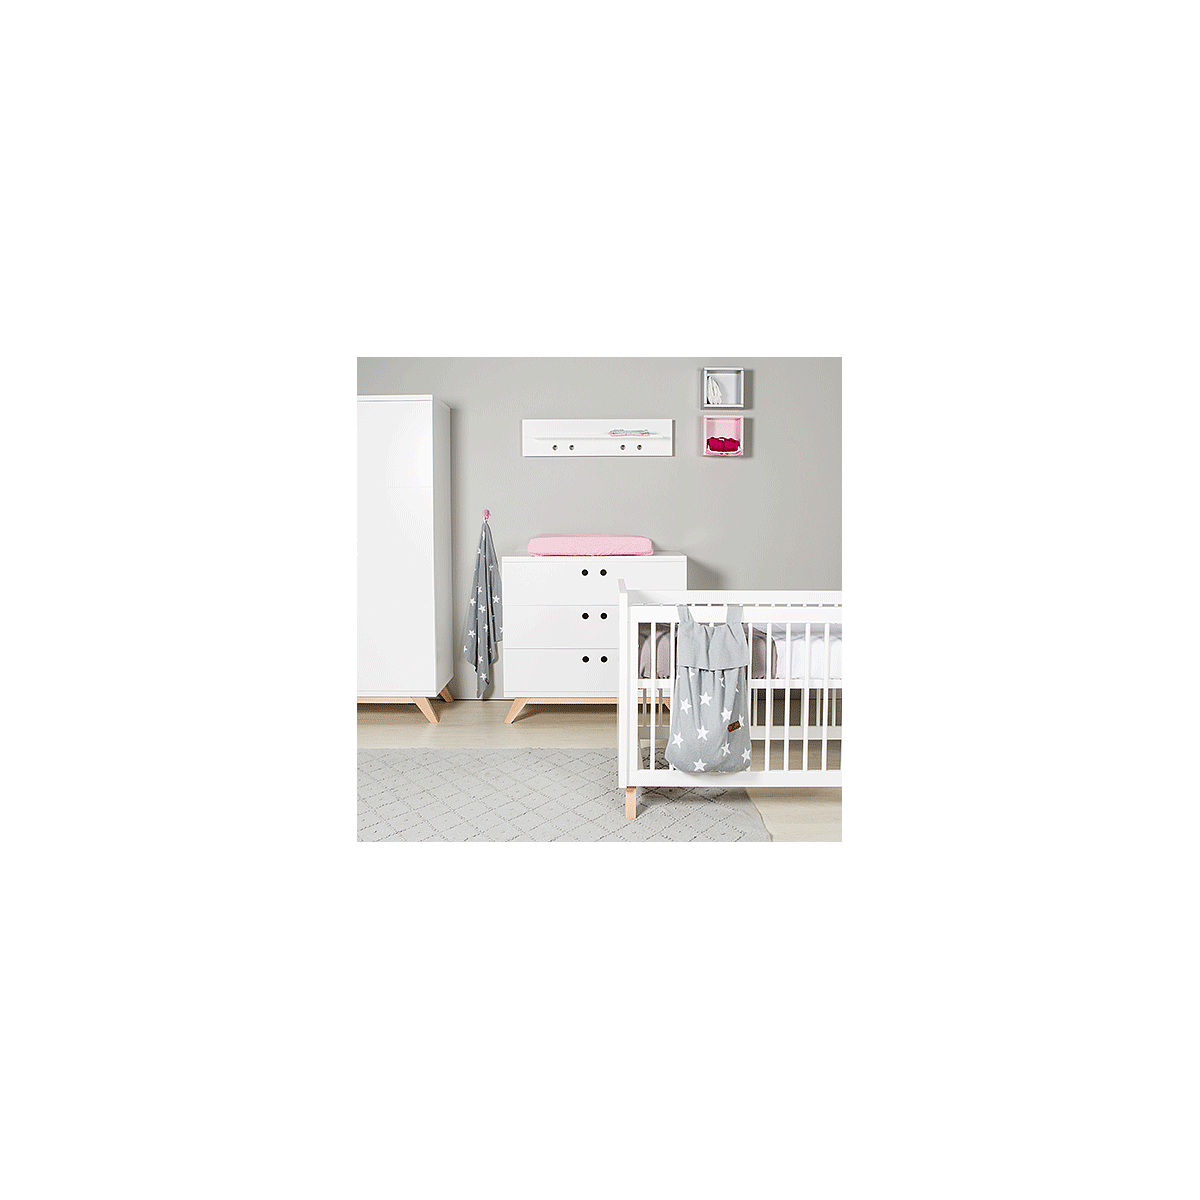 Babybett 60x120cm LYNN Bopita weiß-natur